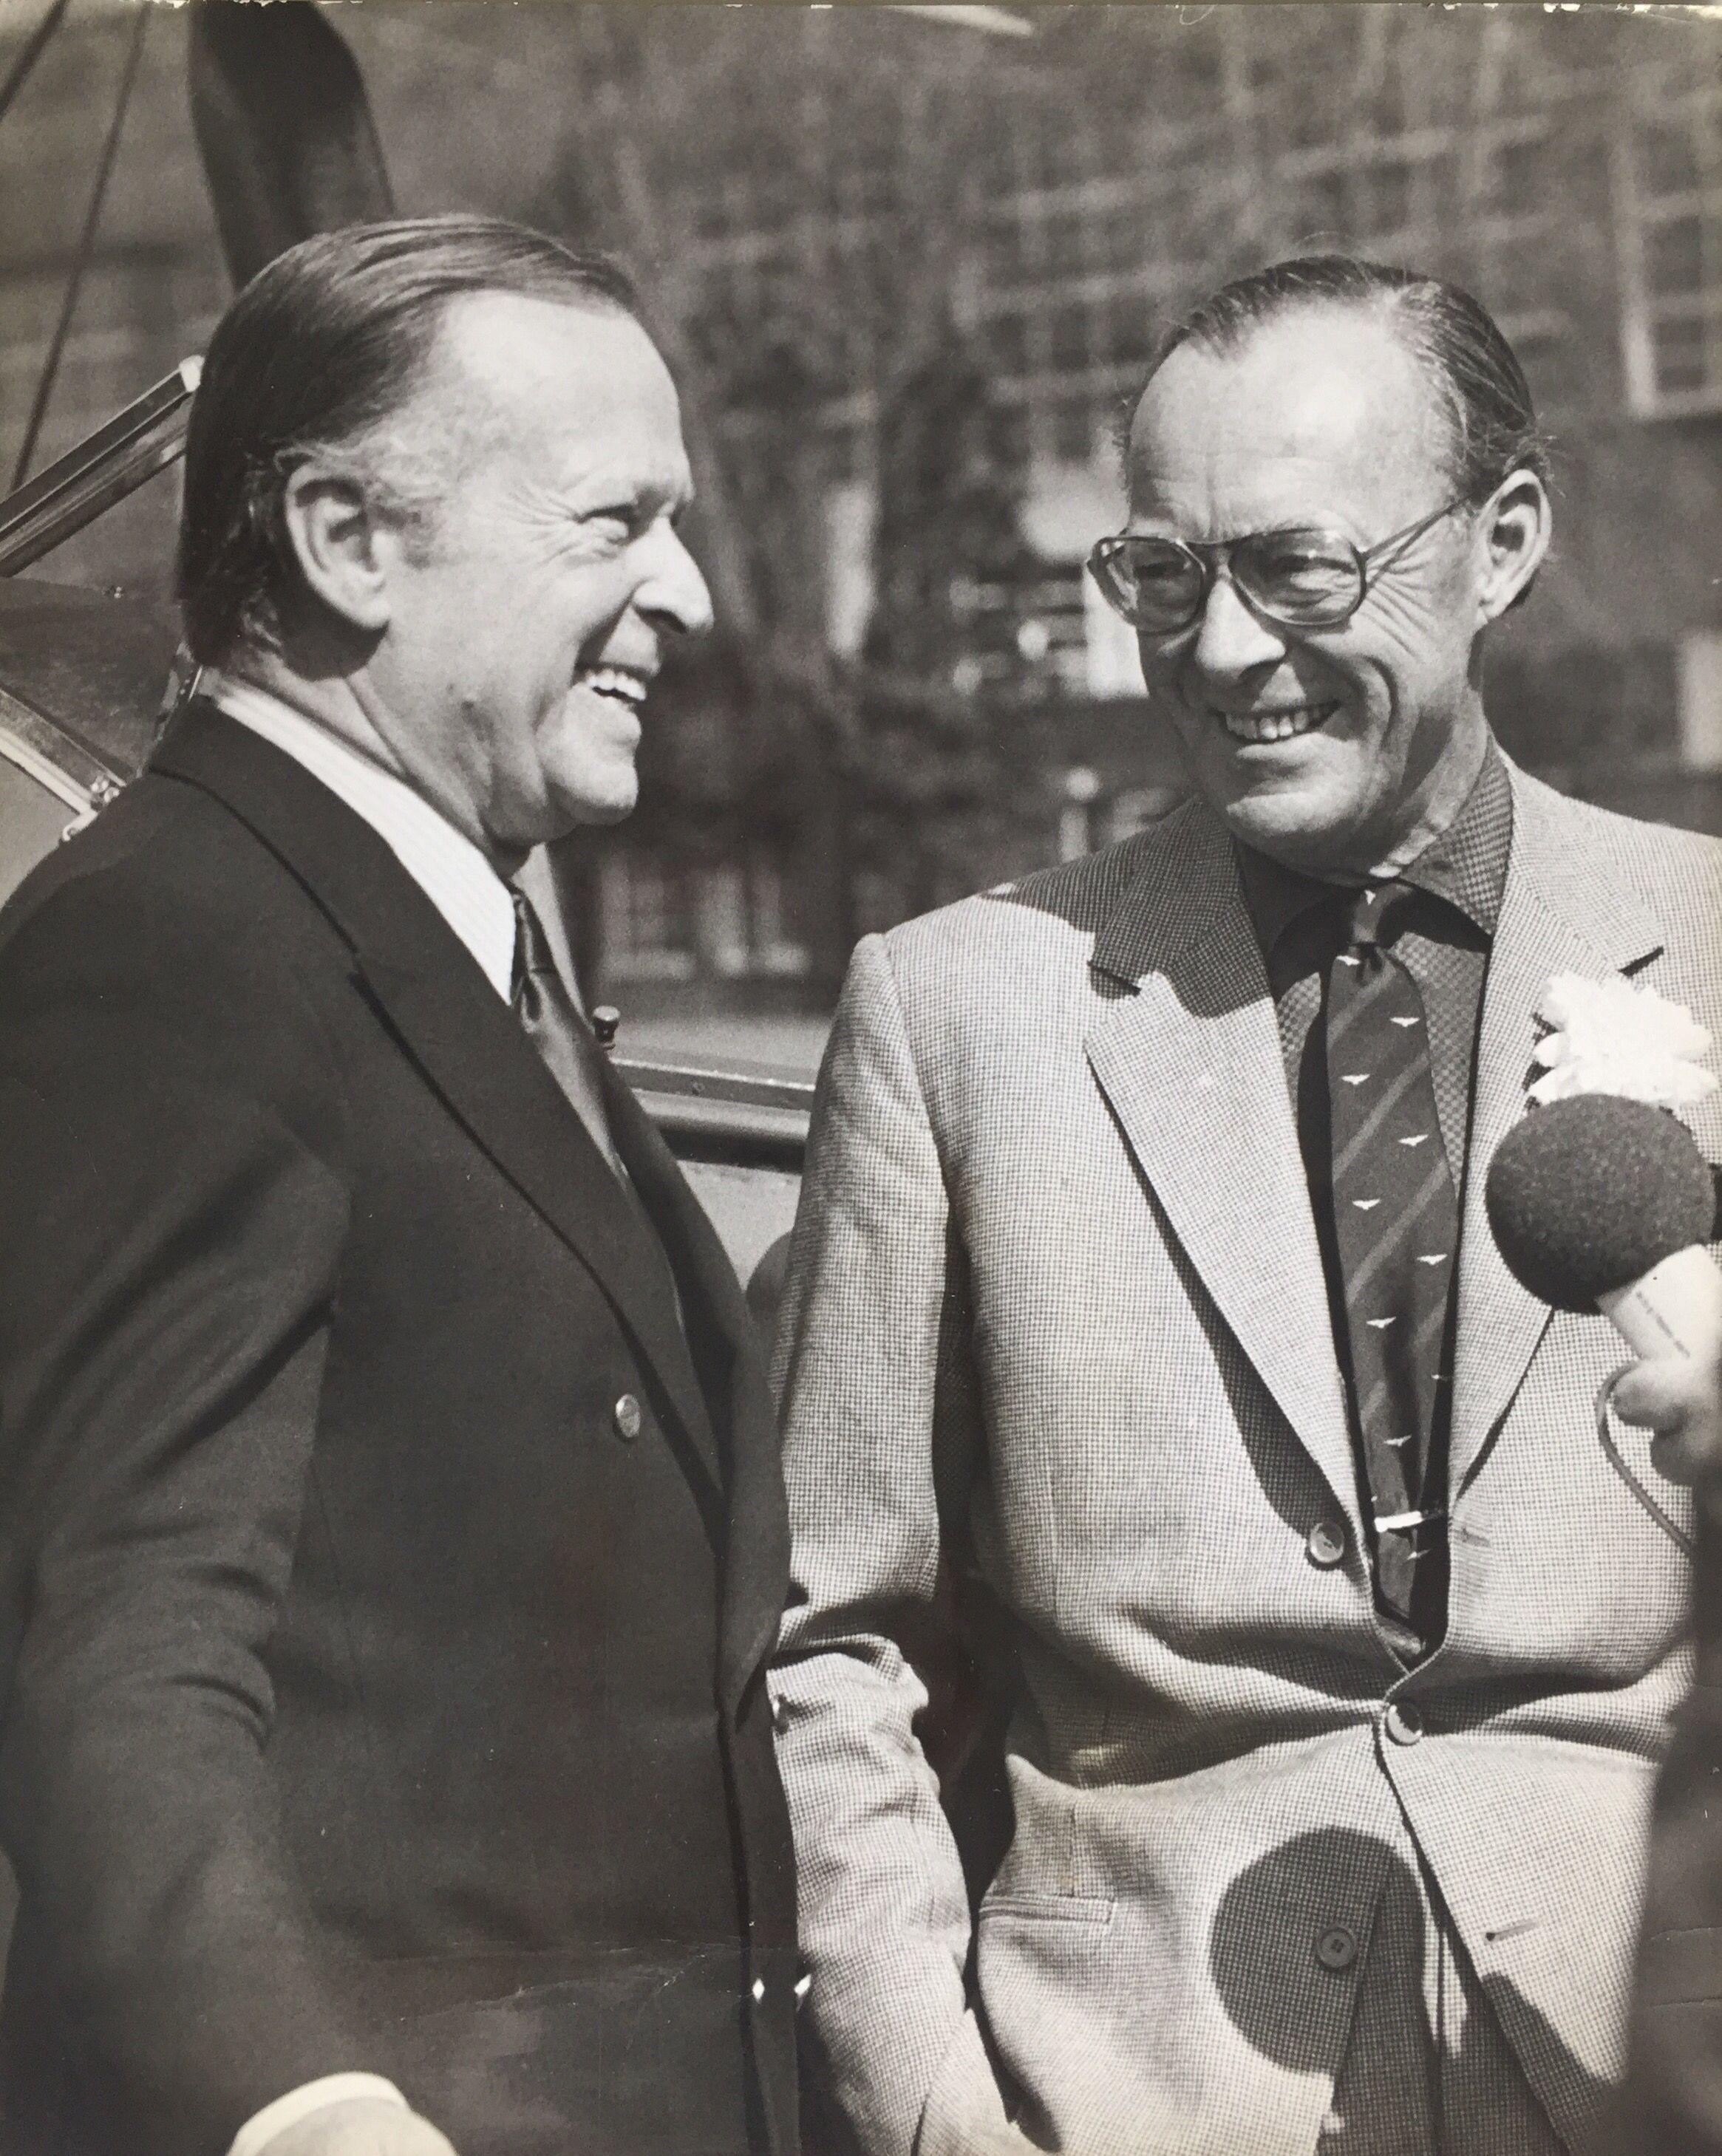 Erik Hazelhoff Roelfzema + Prins Bernhard   Soldaat van